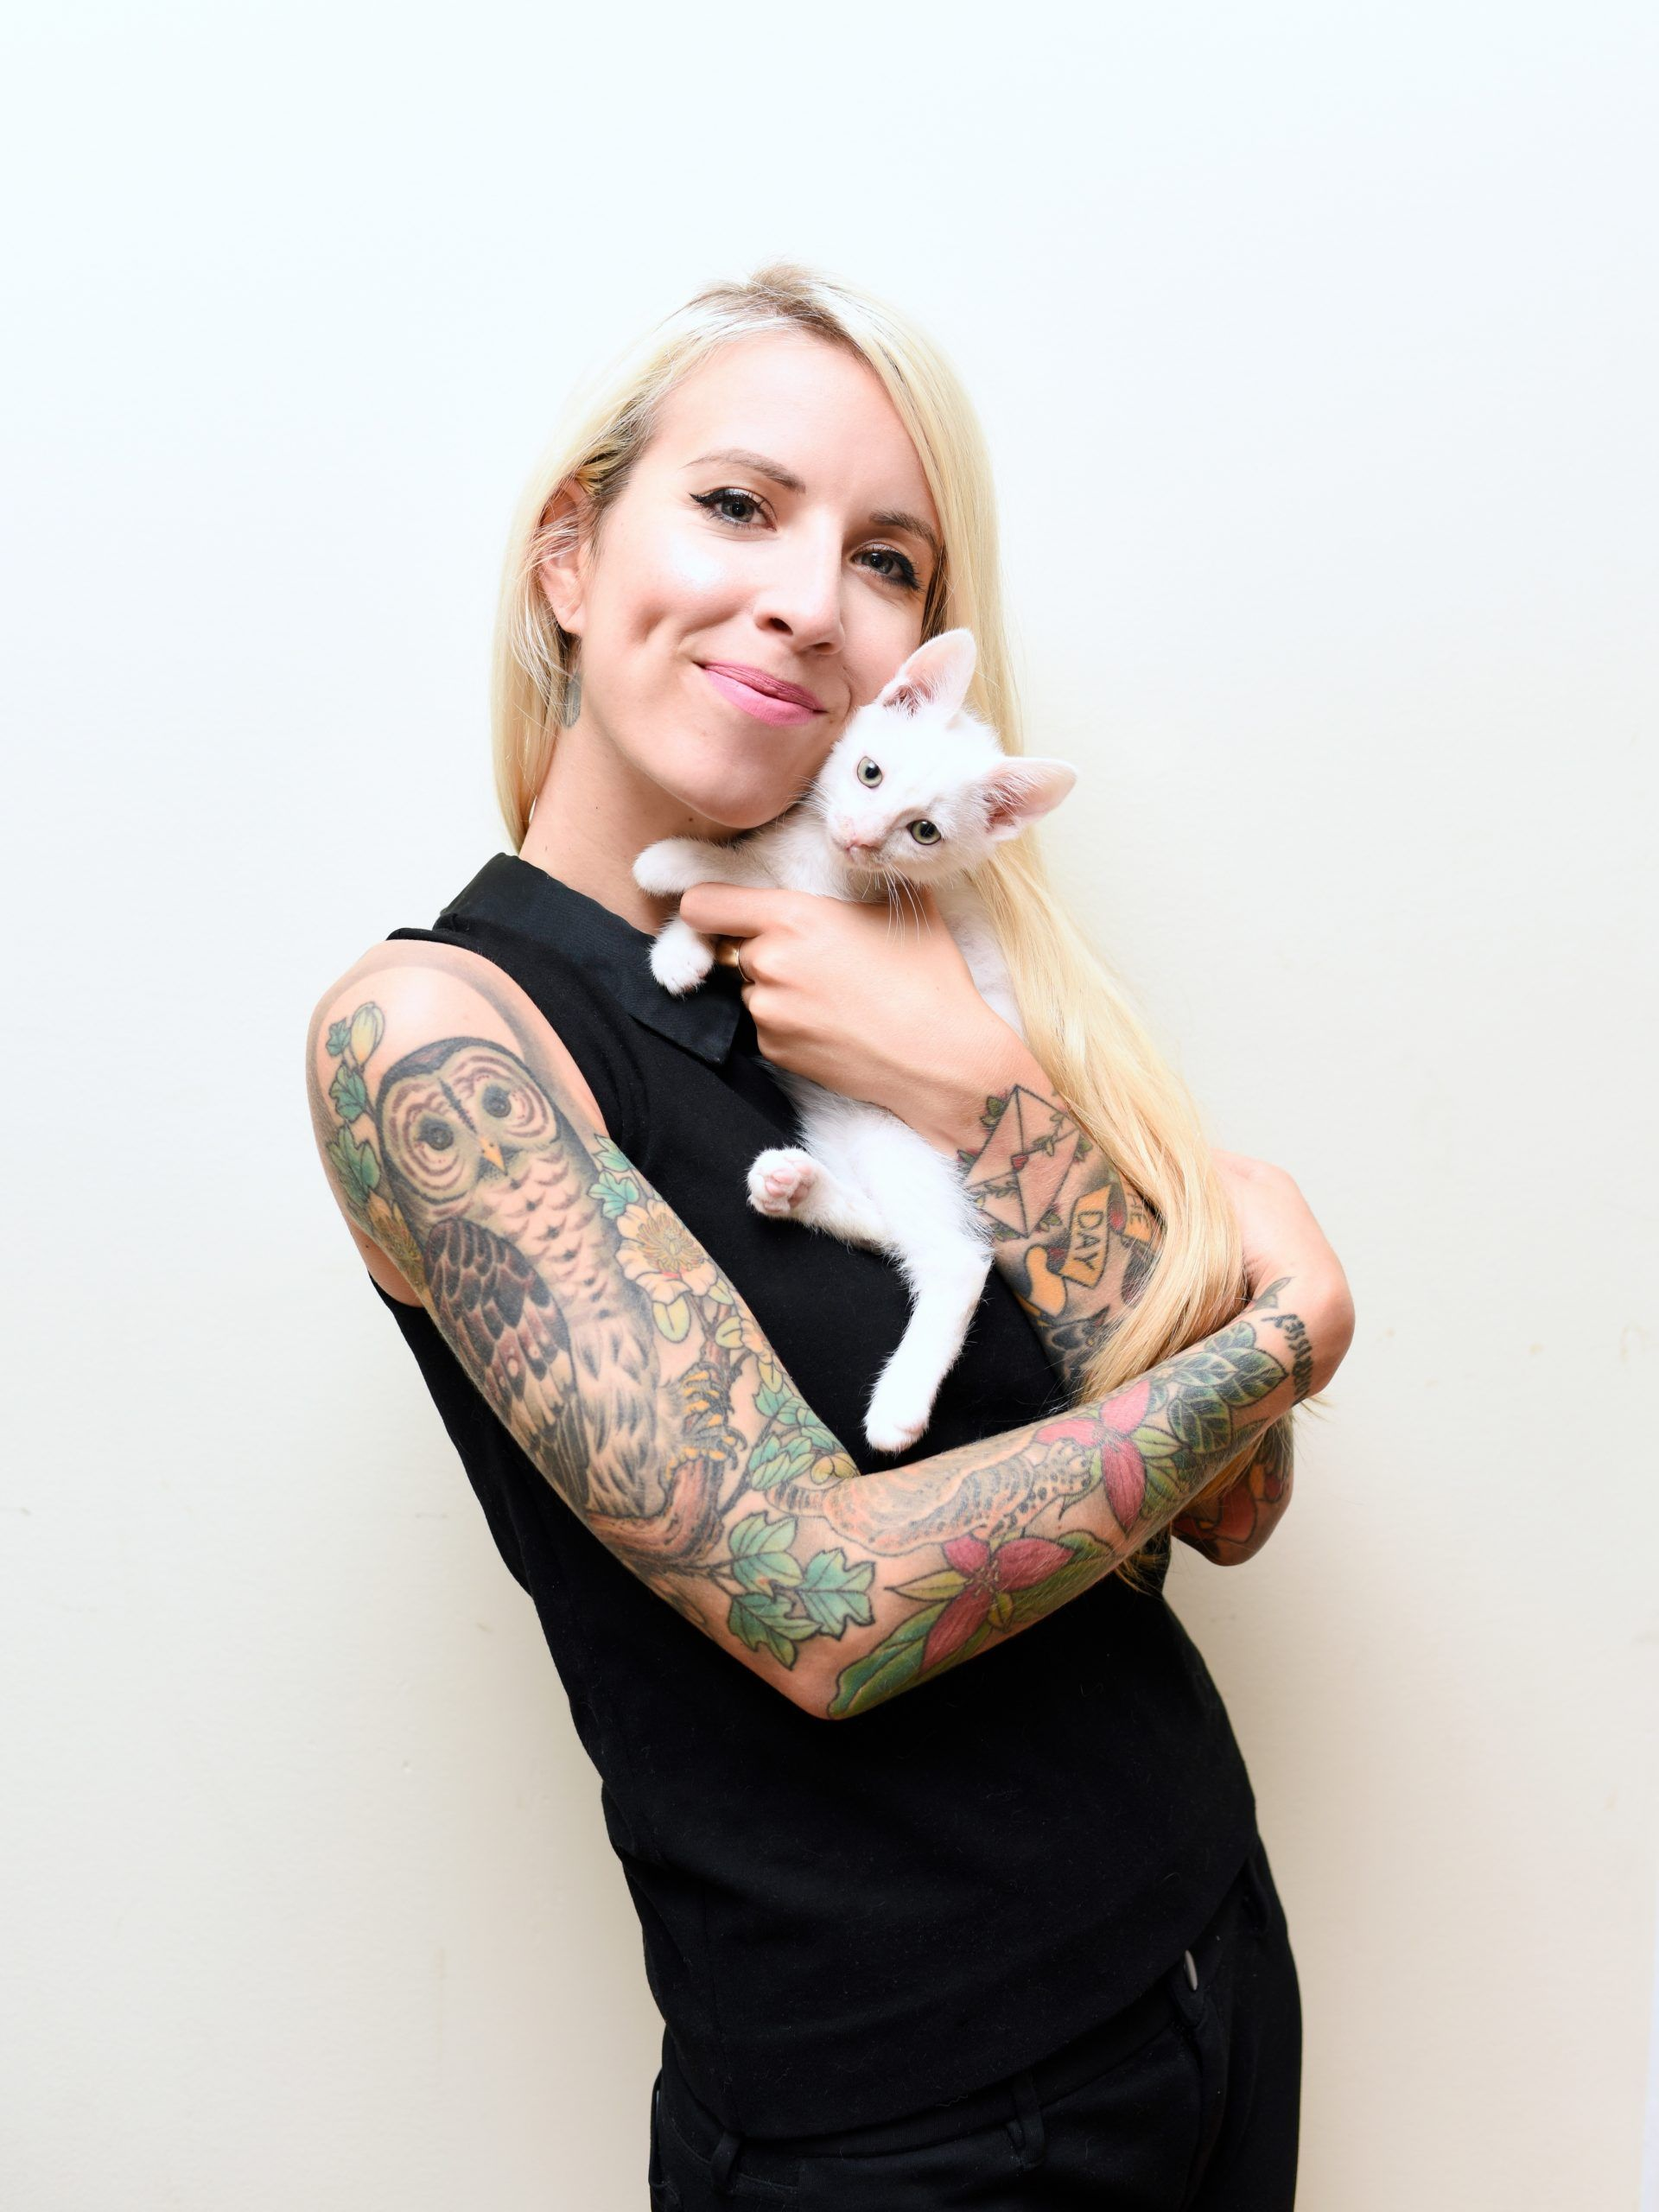 Kitten Lady Hannah Shaw Tiny But Mighty Her Guide To In 2020 Kitten Care Kitten Newborn Kittens